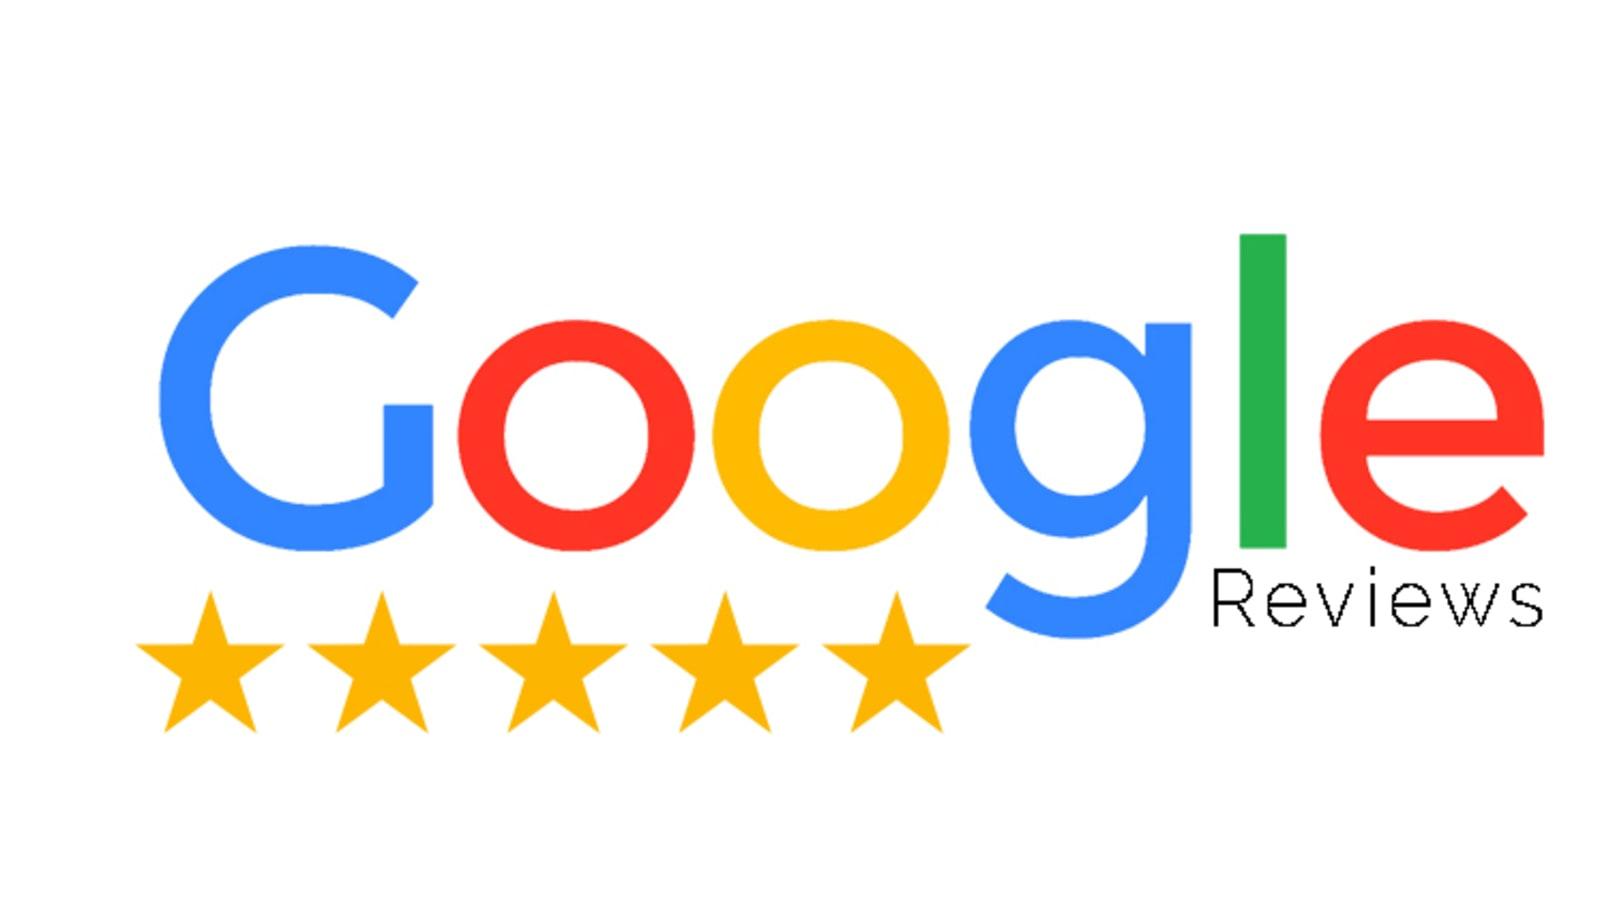 Google Reviews Entry Education